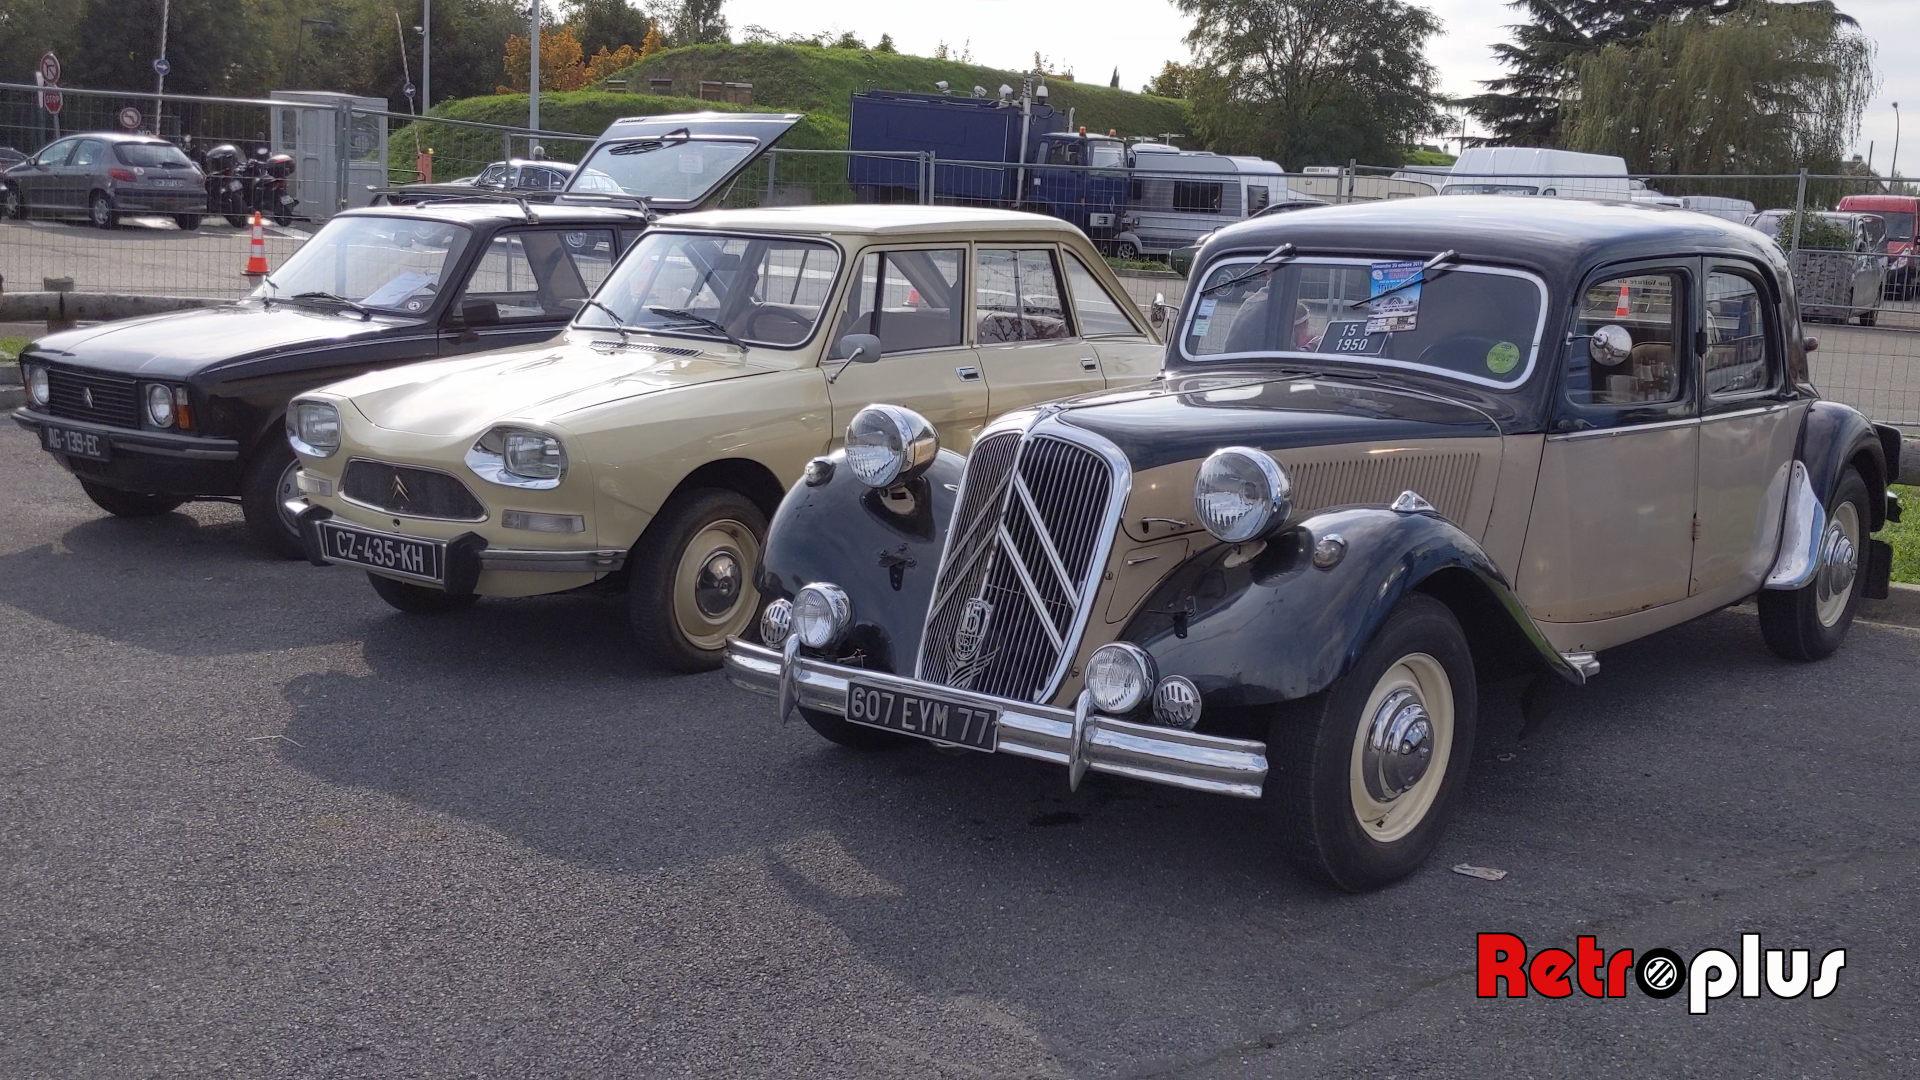 Automedon2019-parkingCitroen11